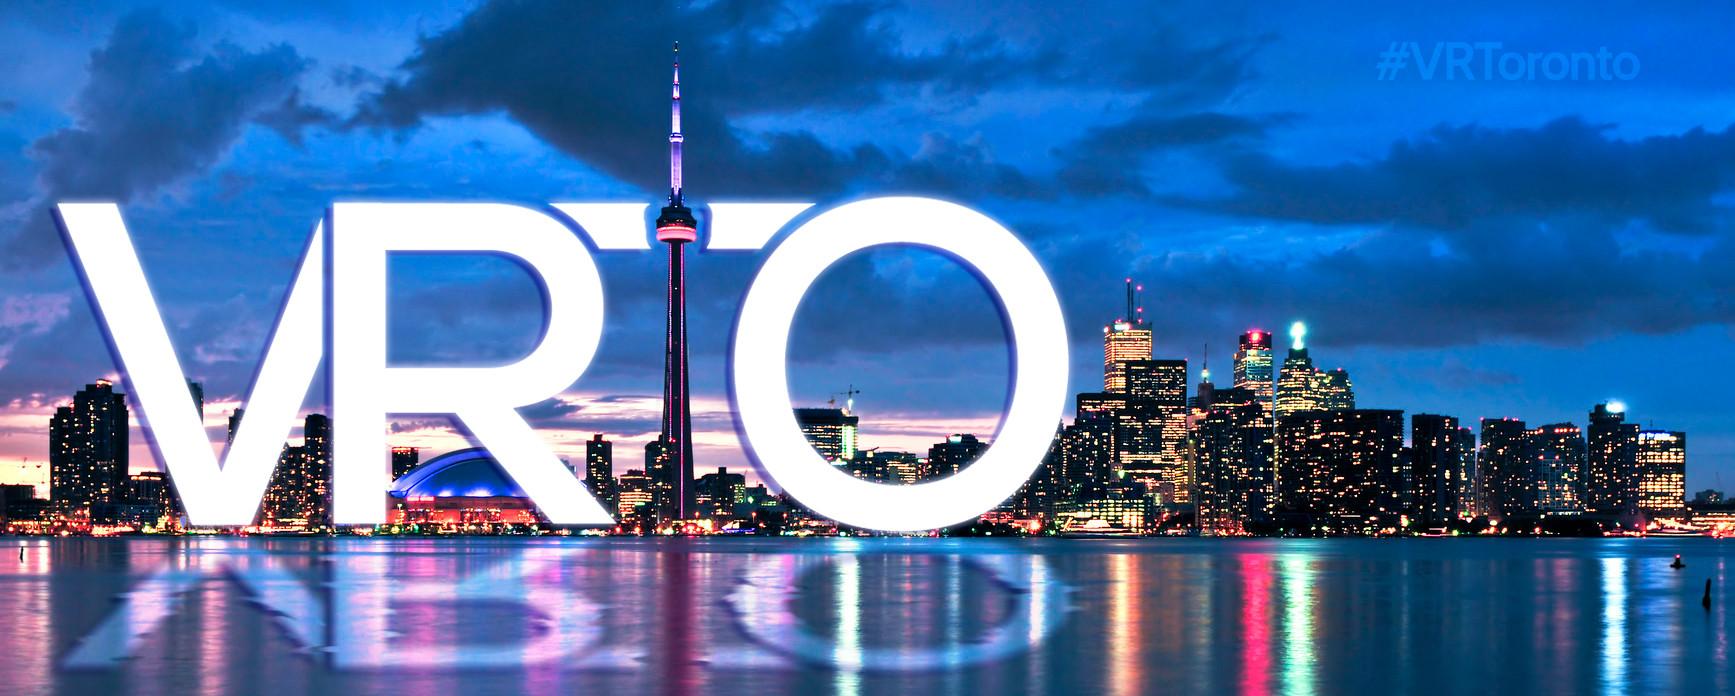 VRTO Virtual reality meetup Toronto